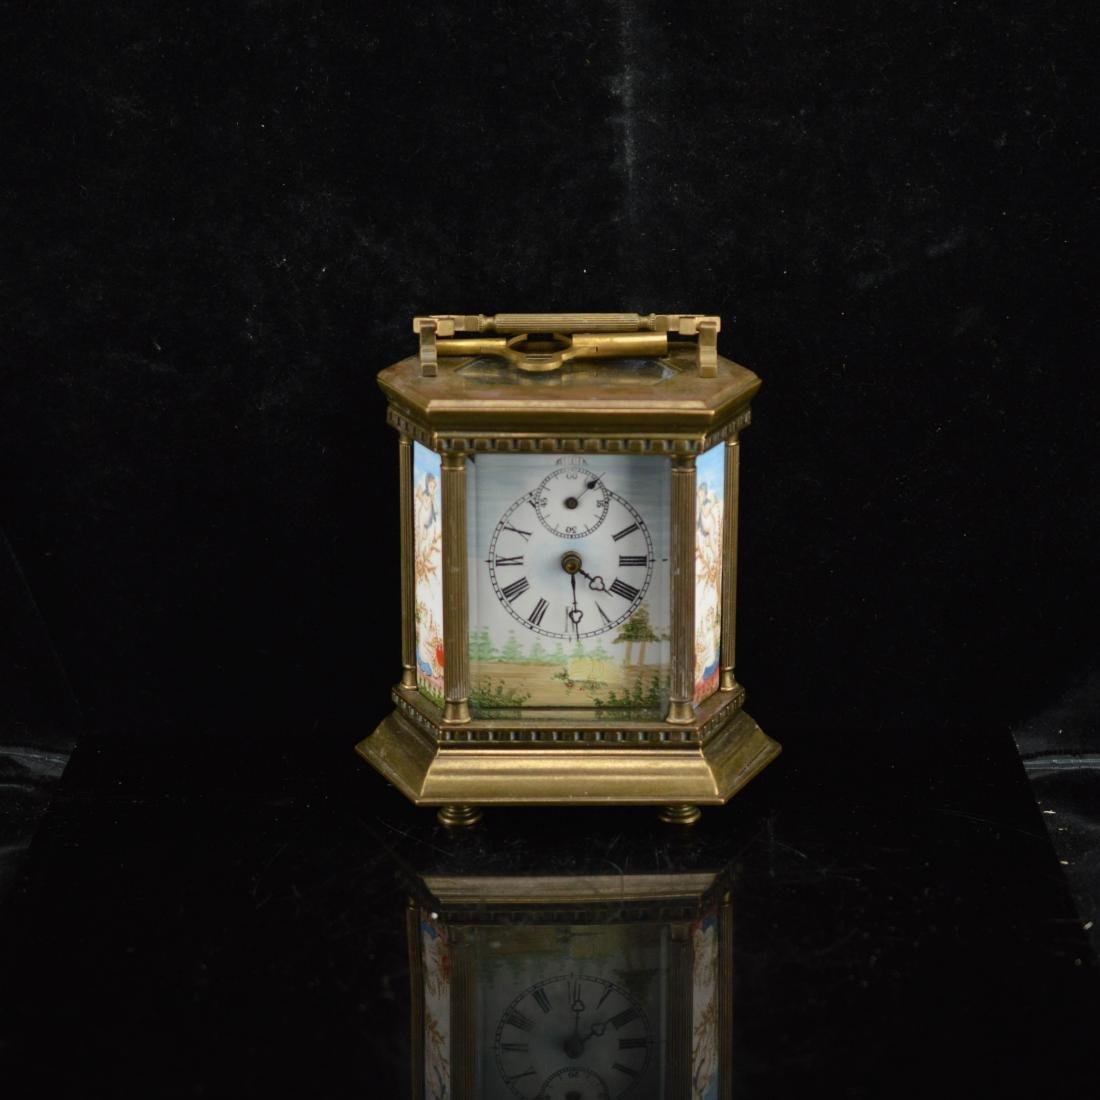 Clockwork Tabletop clock